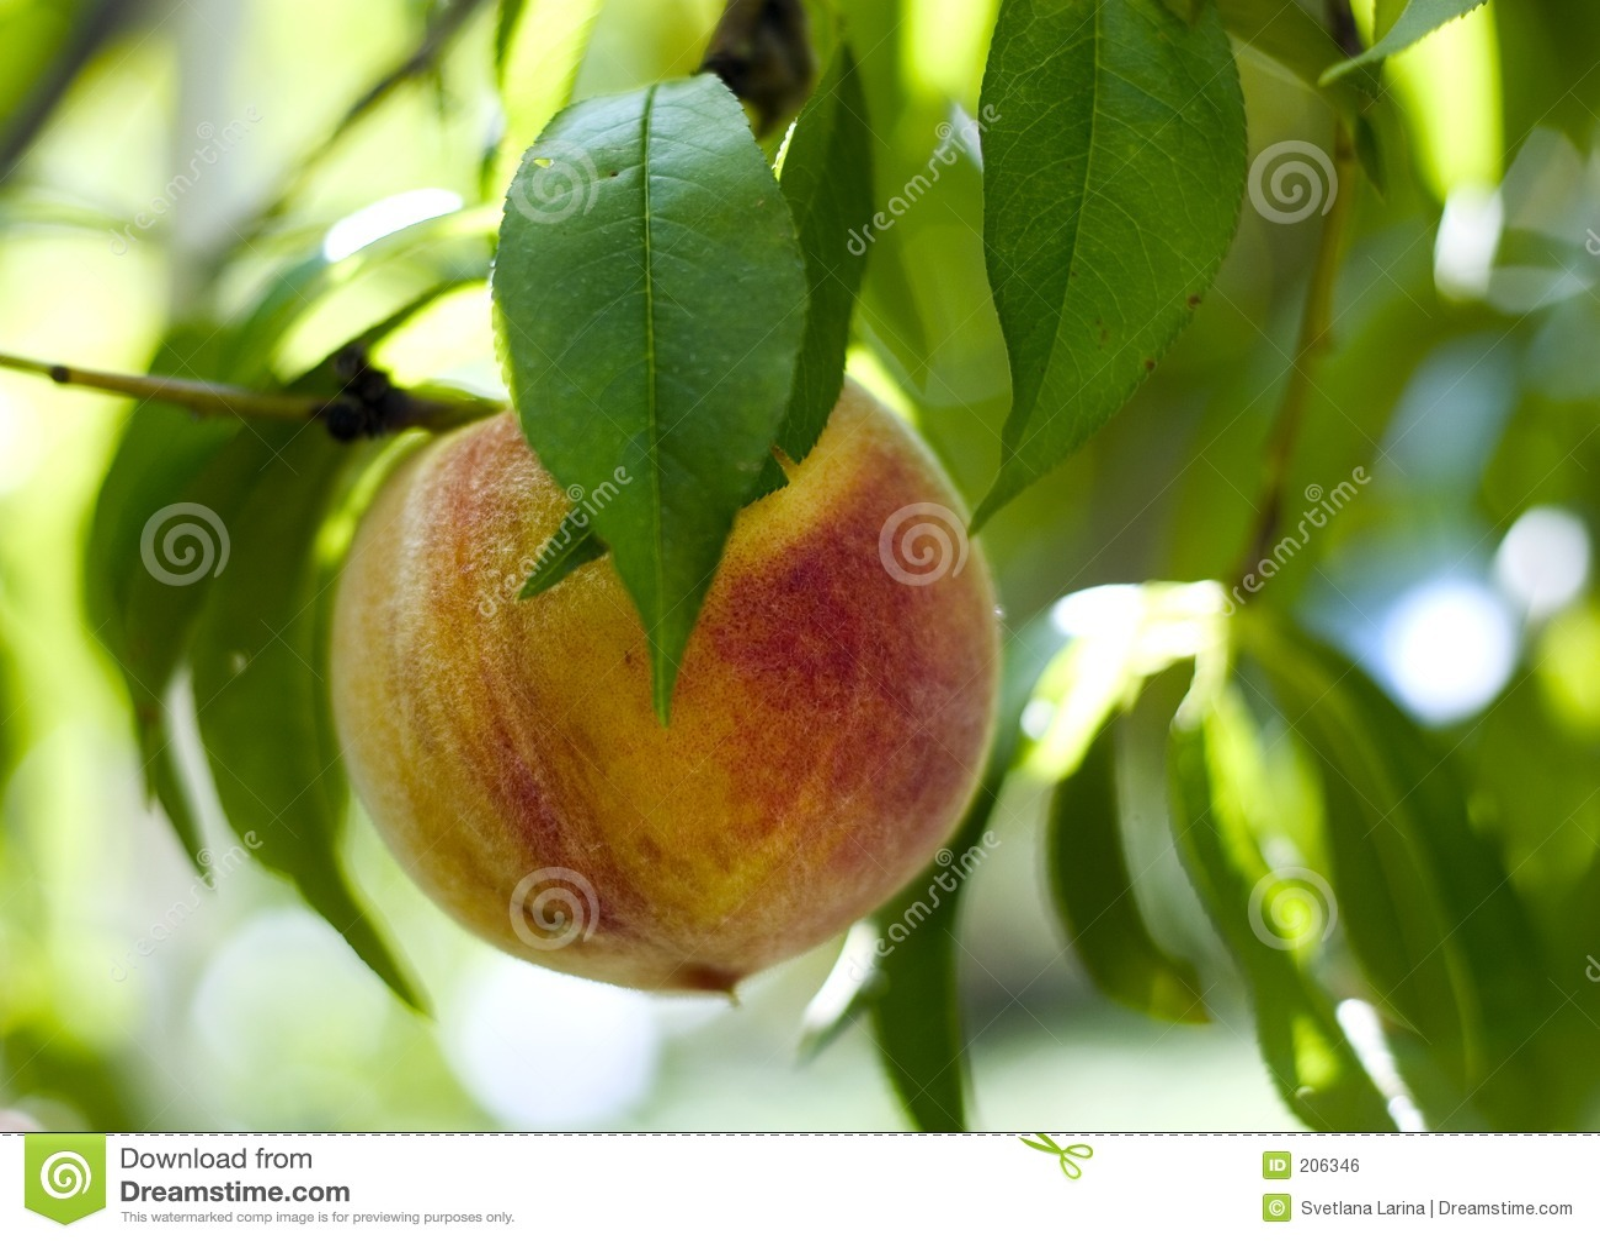 вал богачей персика харча